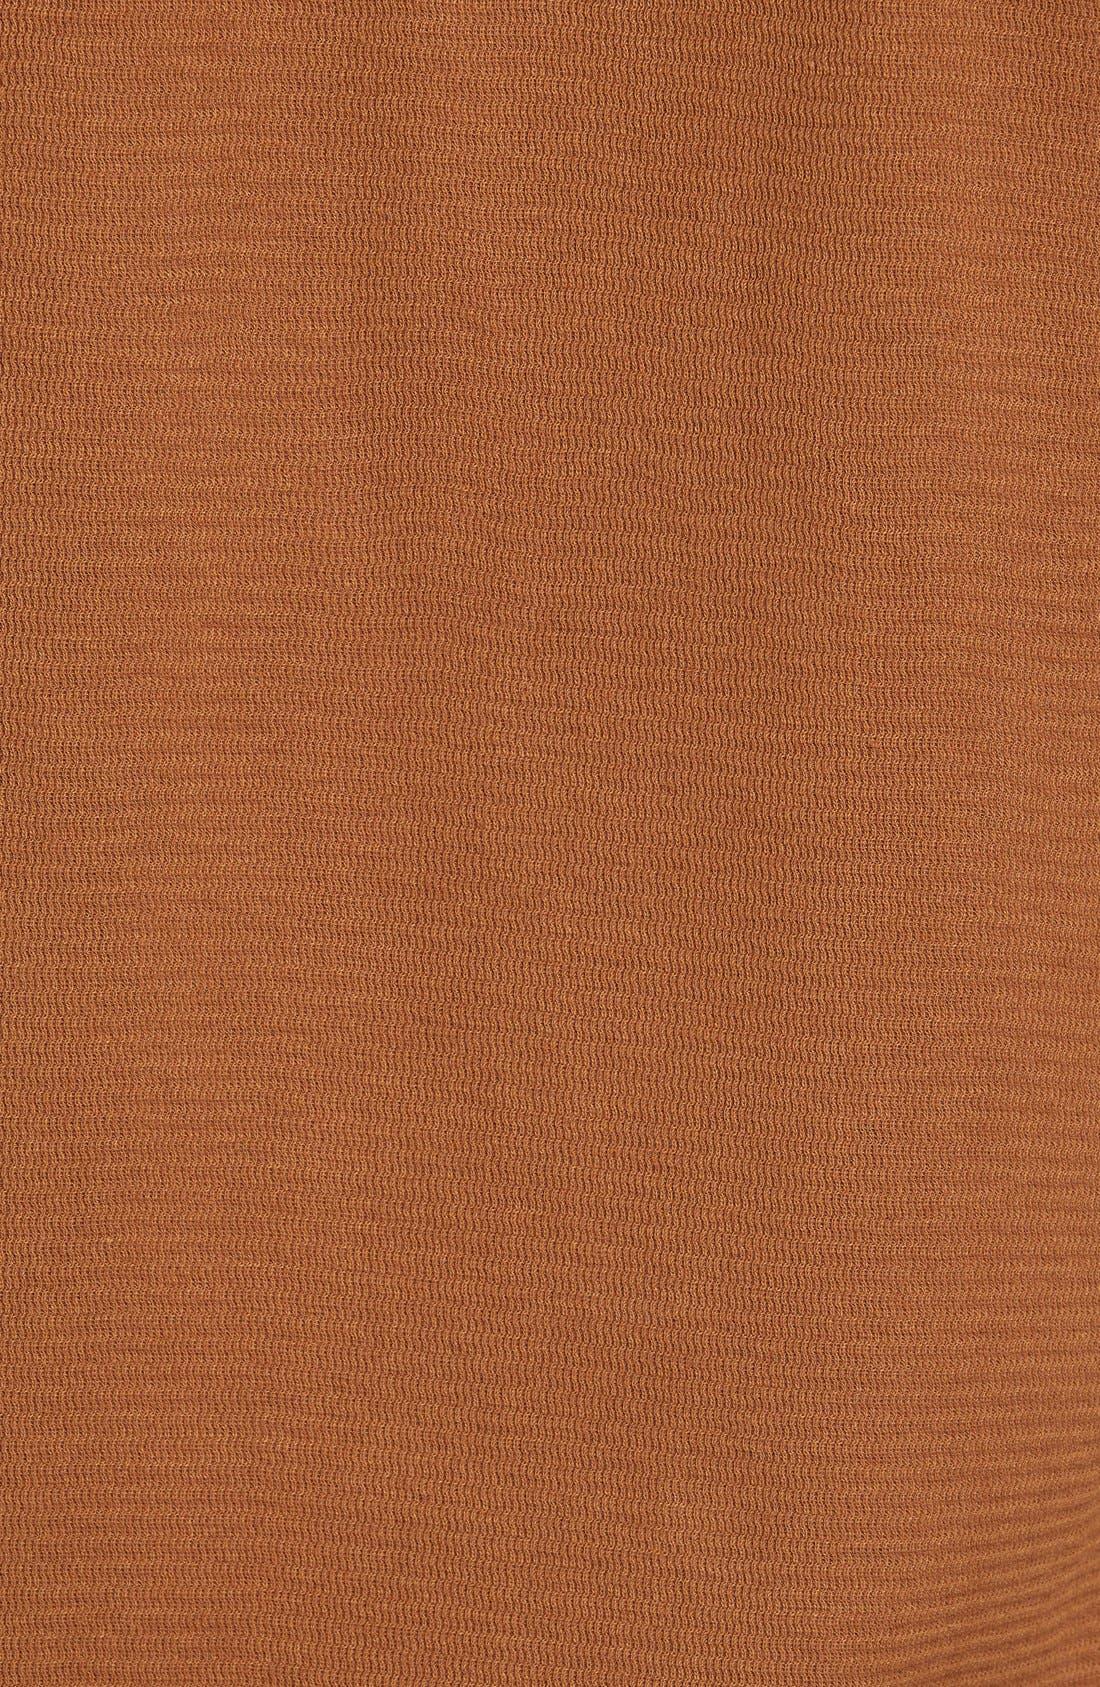 Larsen Zigzag Thermal T-Shirt,                             Alternate thumbnail 18, color,